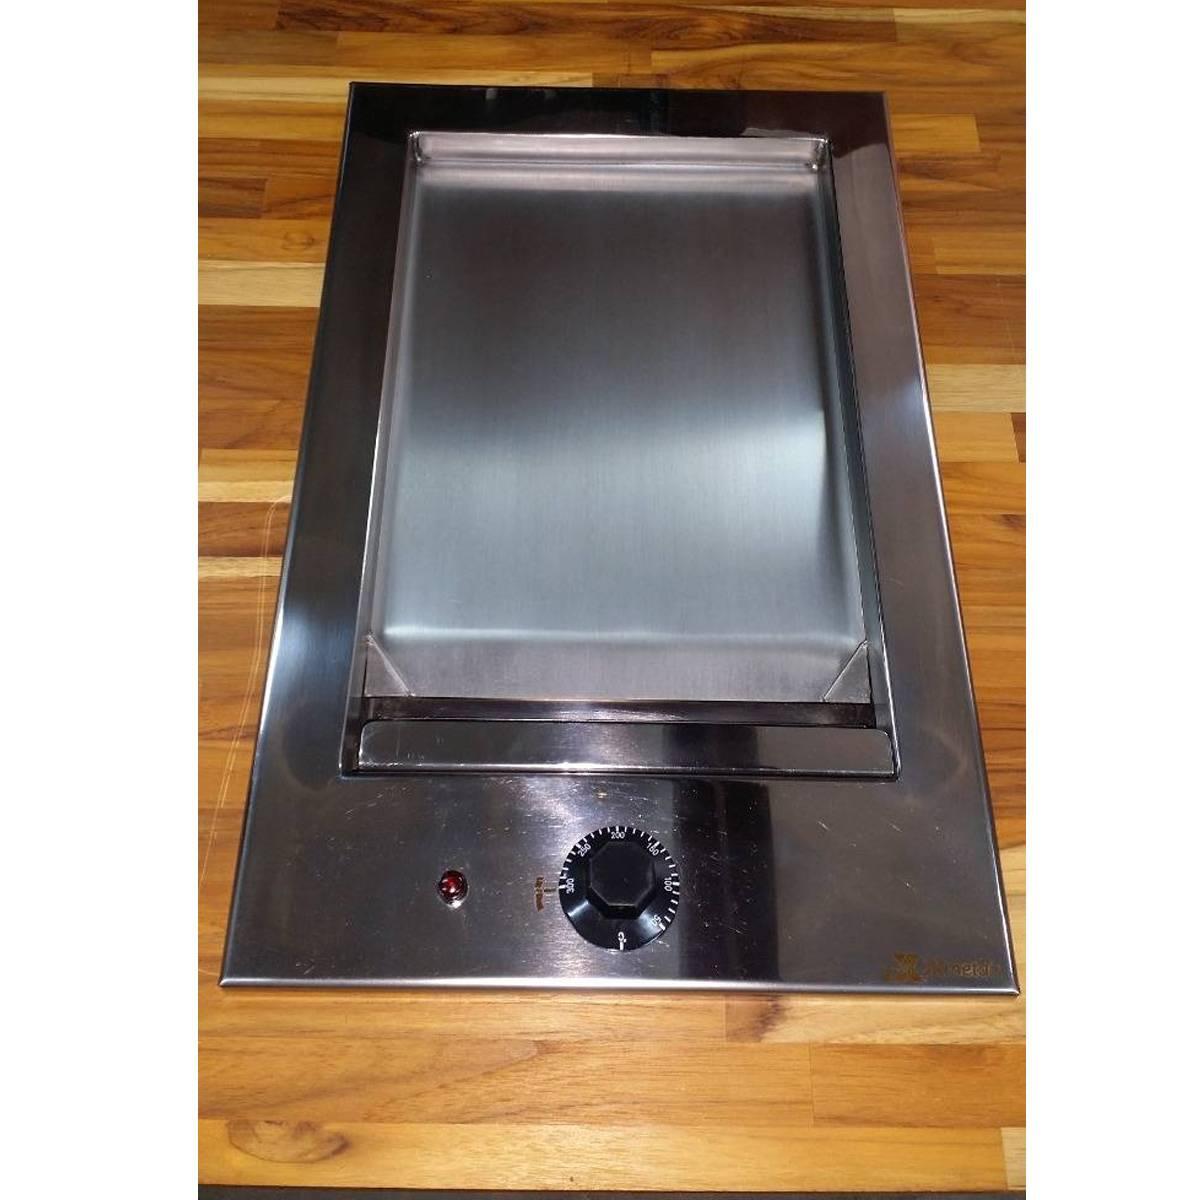 Chapa de Lanche Gourmet Elétrica Inox de Embutir JX Metais - 40x50  - Sua Casa Gourmet e Cia